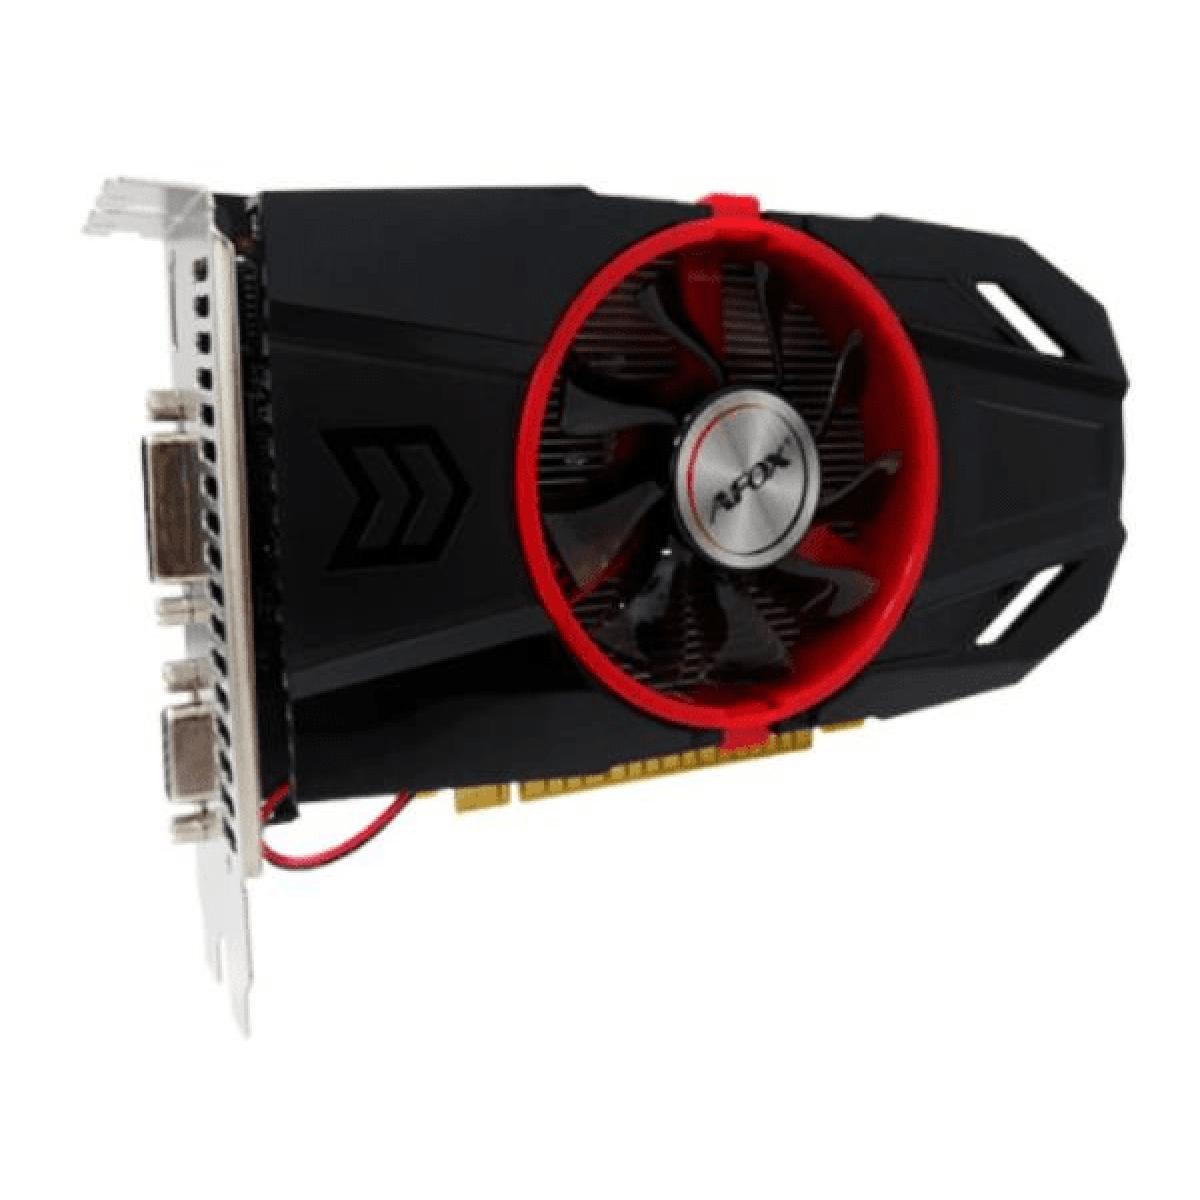 Placa de Vídeo Afox, GeForce GTX 750 TI, 4GB, DDR5, 128Bit, AF750TI-4096D5H4